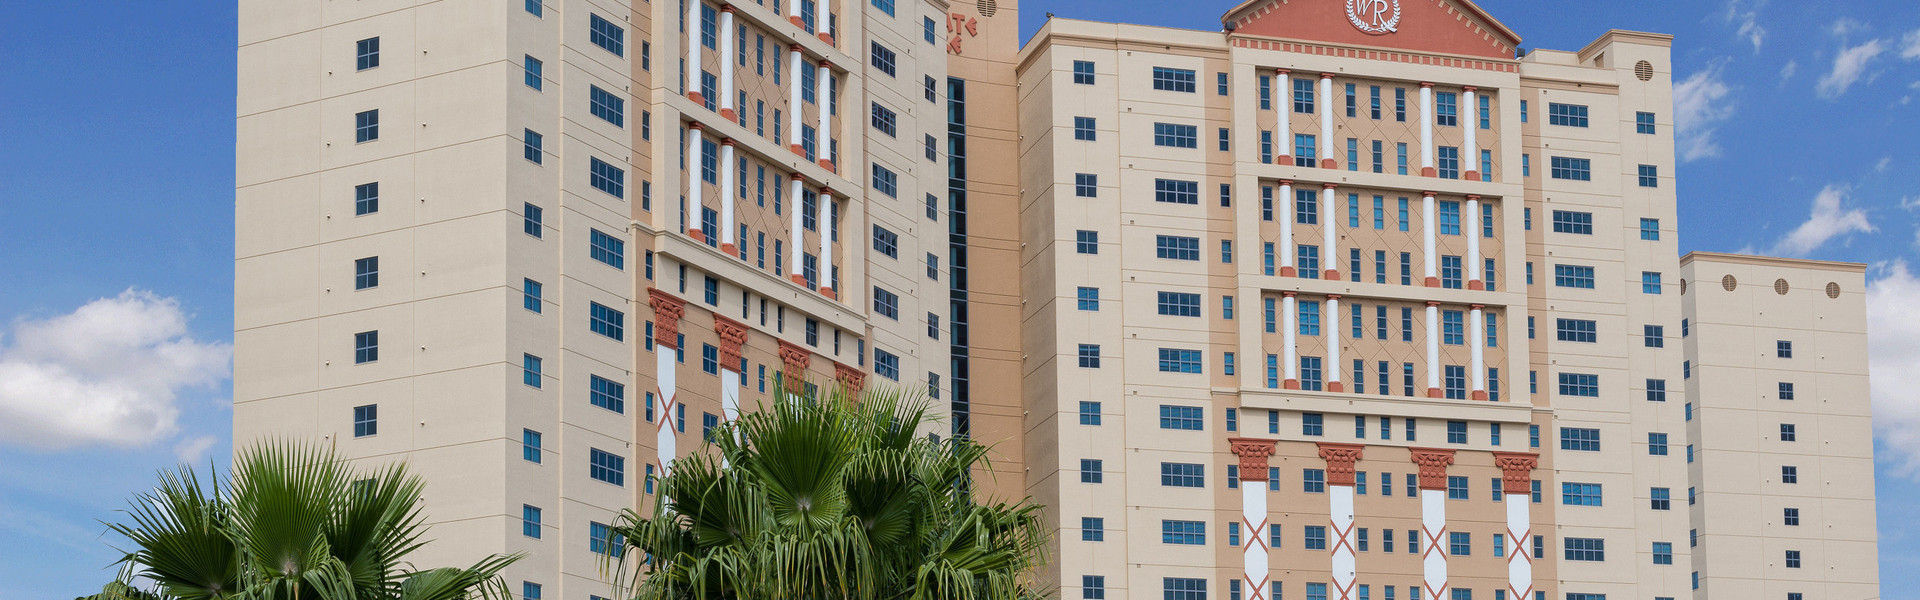 Pics of Orlando Florida Hotels | Westgate Palace Orlando | Resorts Near International Drive, Orlando, FL 32819